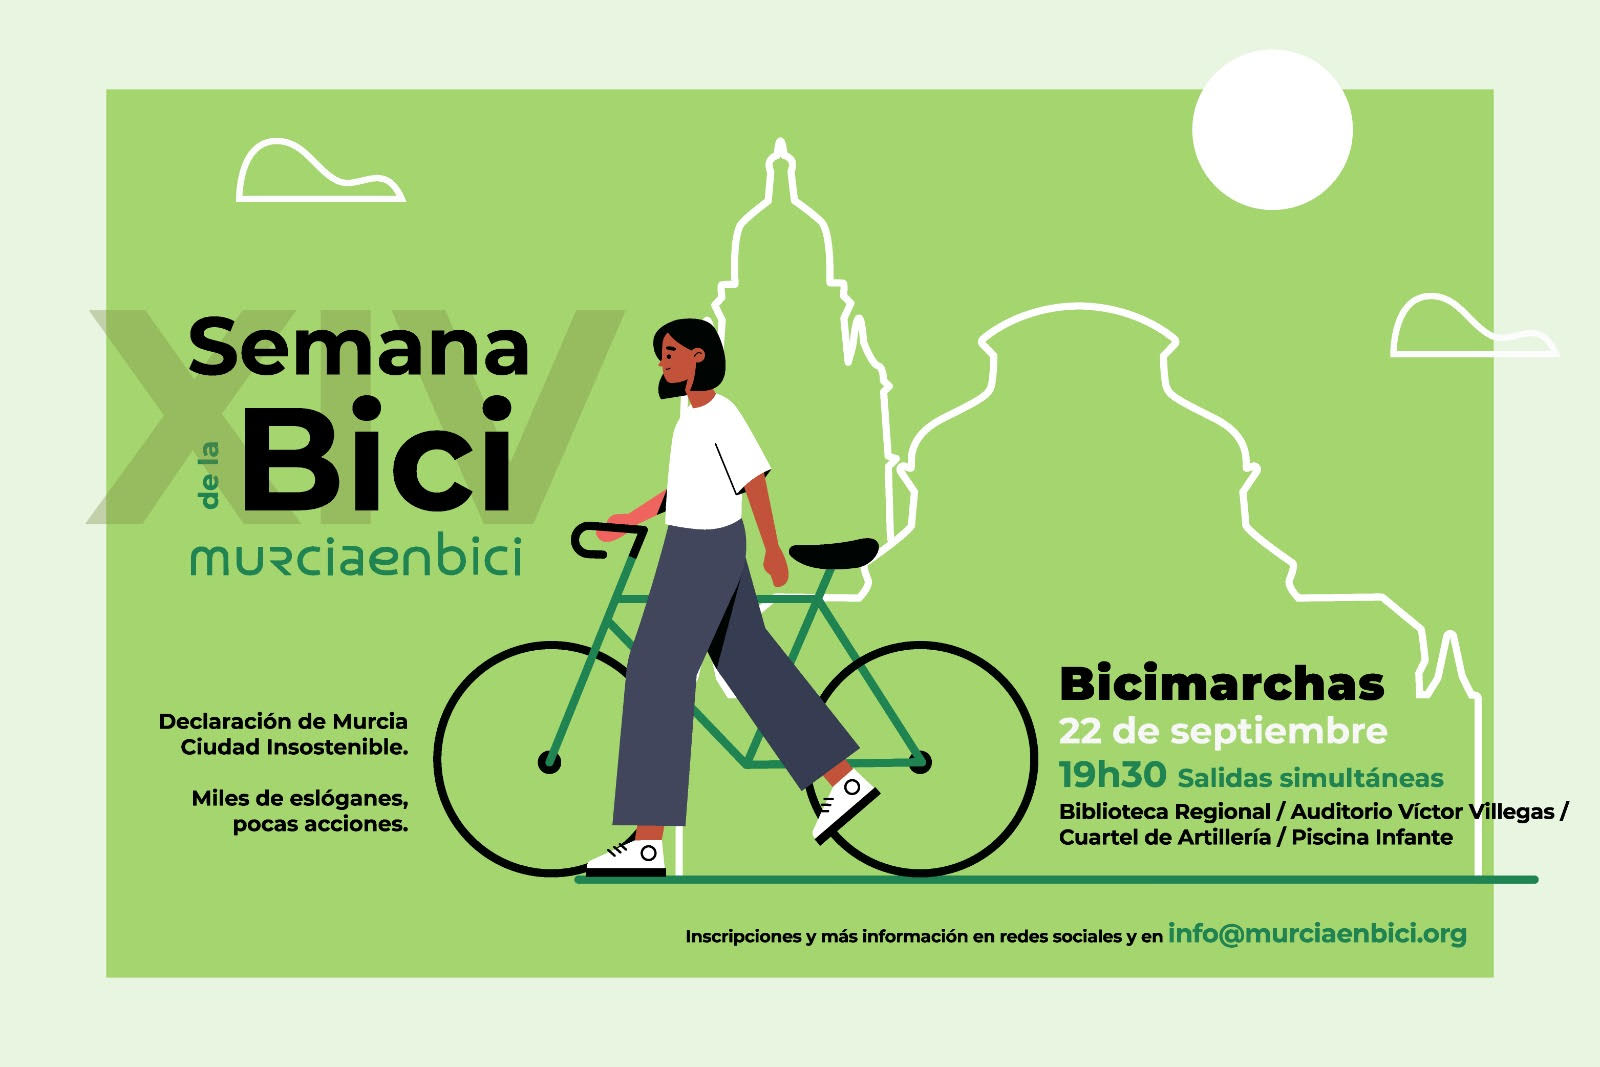 Bicimarchas de Murcia en Bici